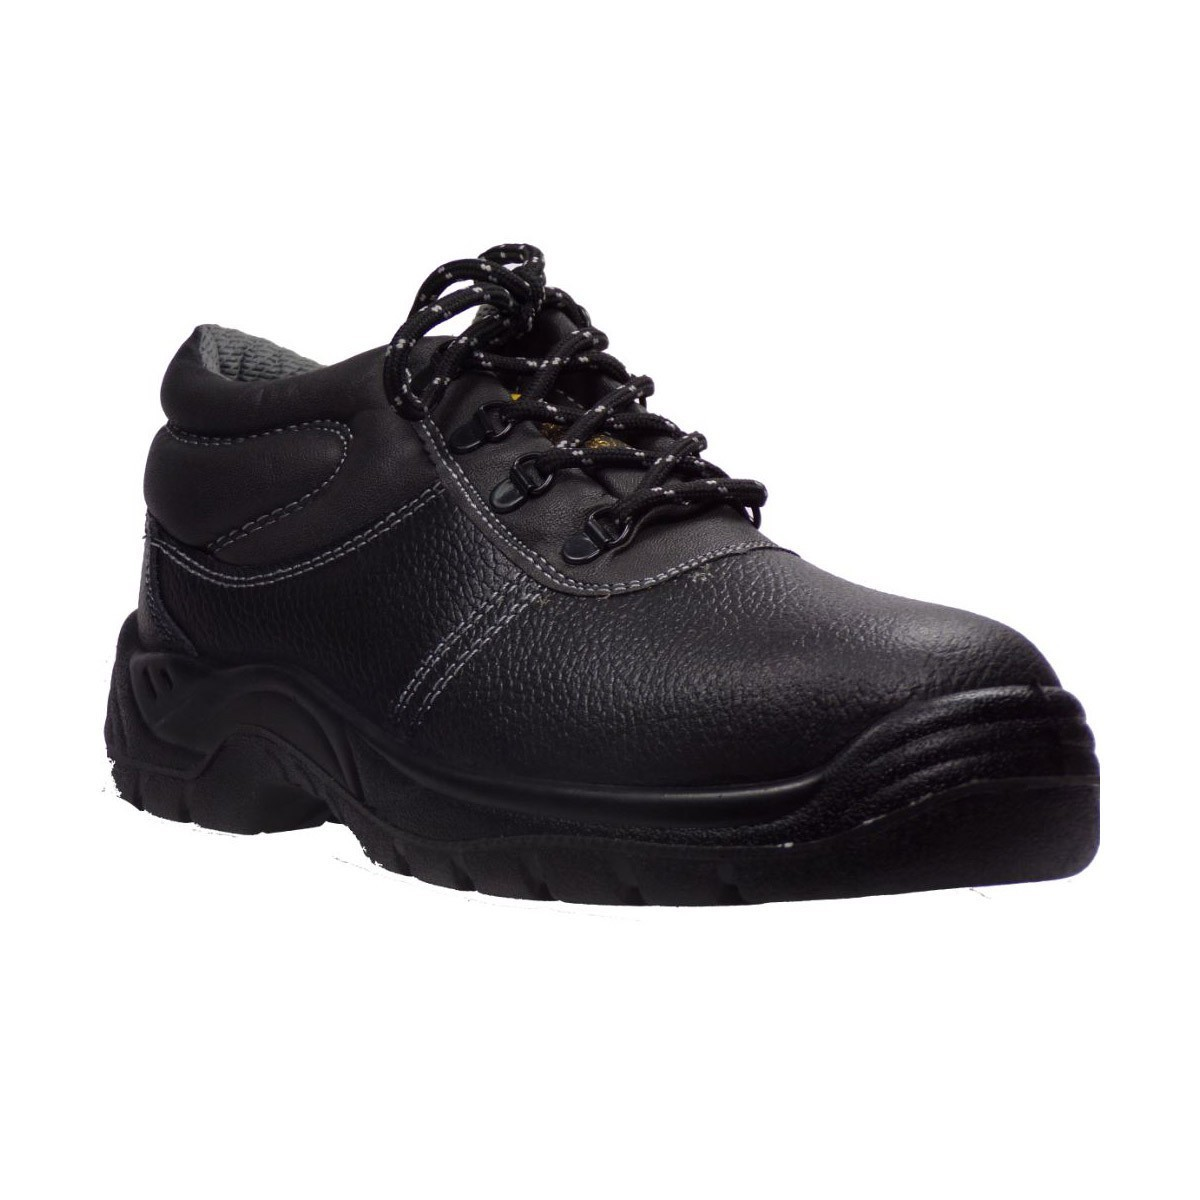 Bagiota shoes Ανδρικά Αρβυλάκια Εργασίας 1000 Μαύρα ...